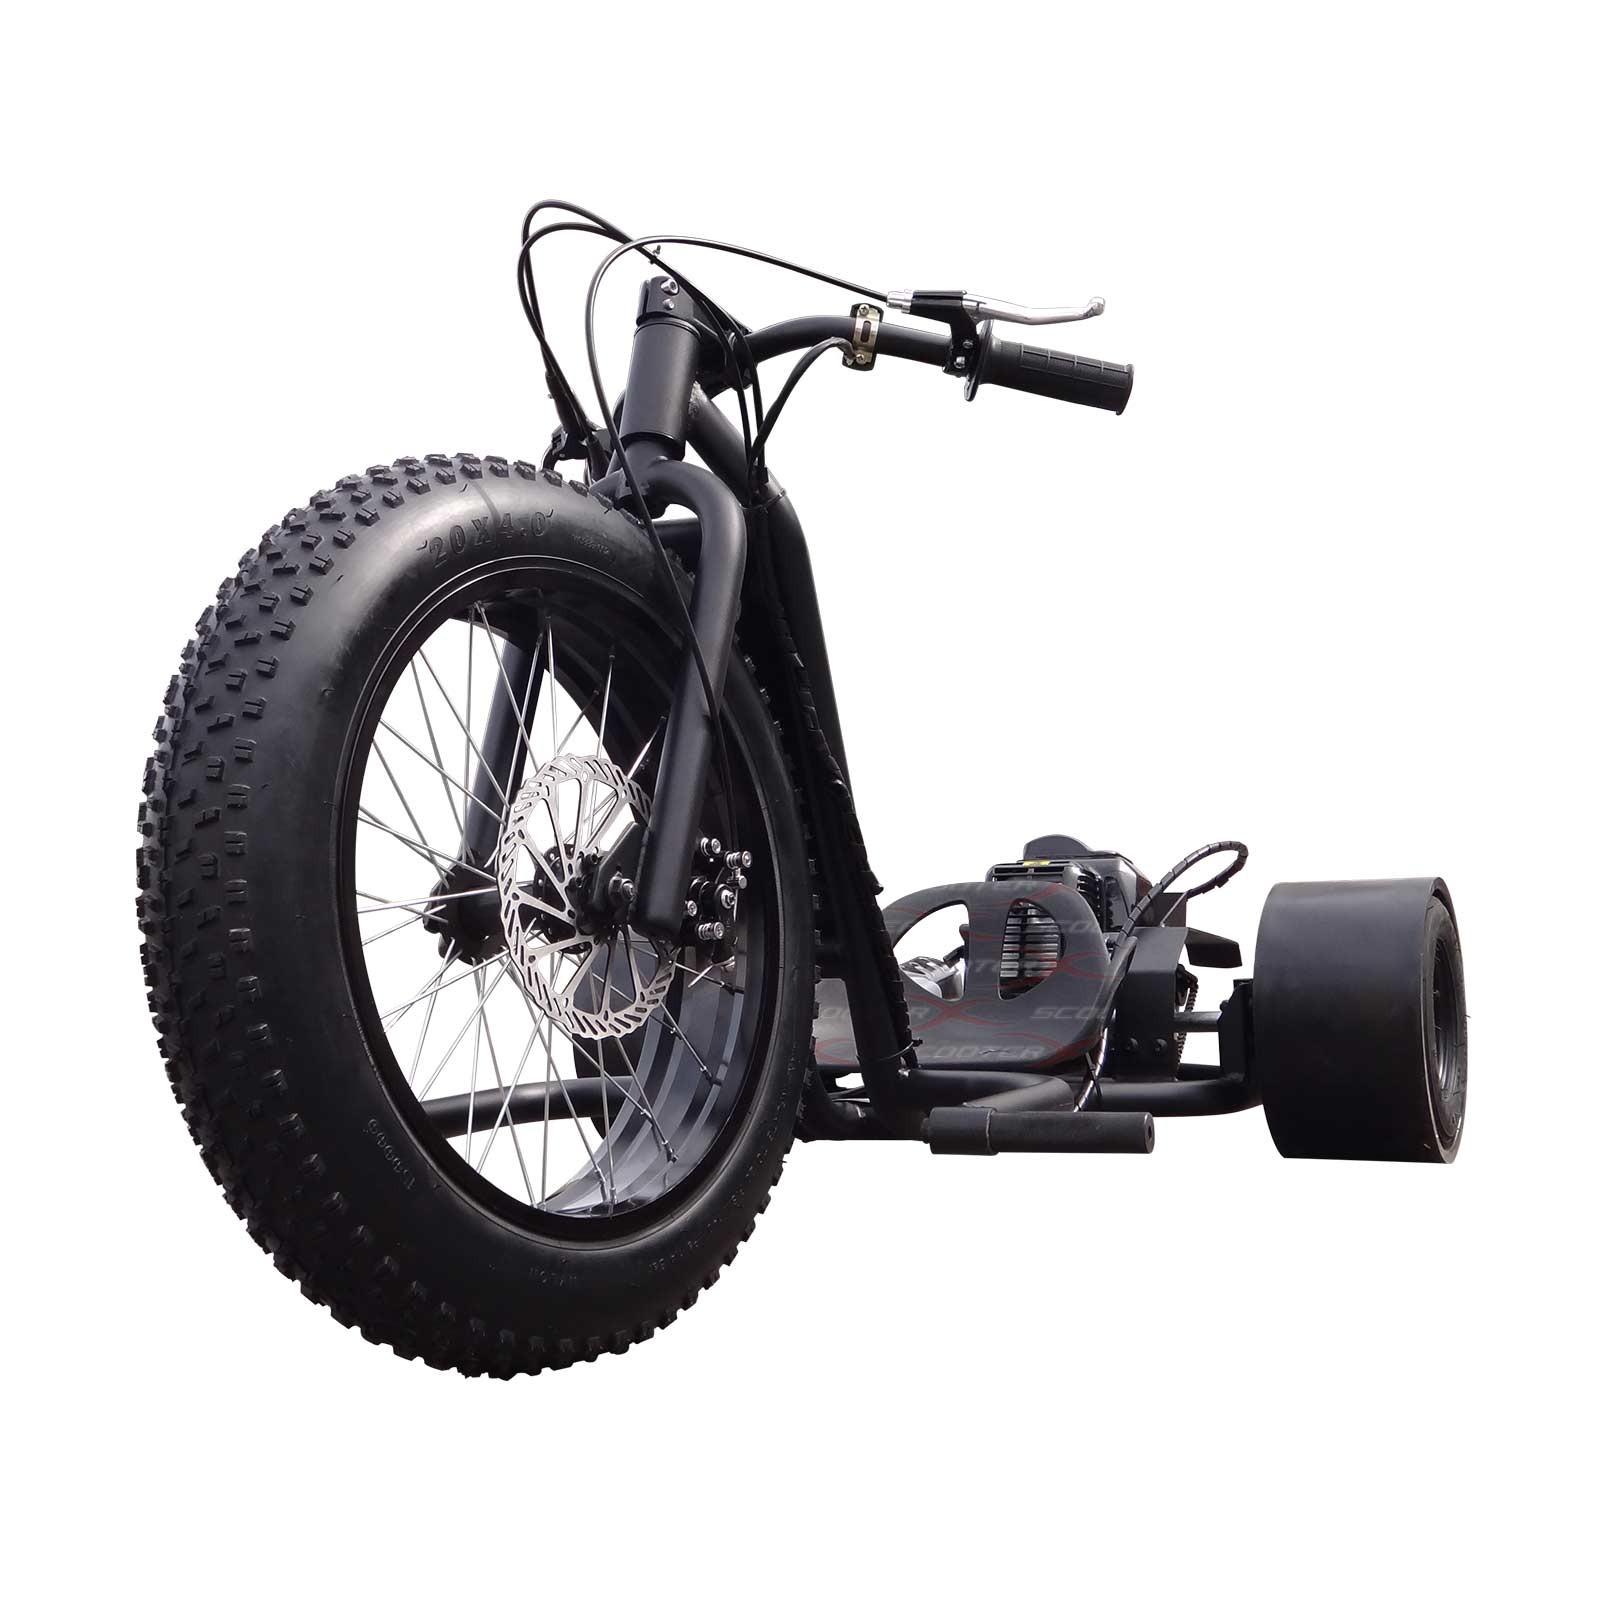 49cc Gas Powered Scooterx Driftmaster Drift Trike Big Wheel 3 Wheeler Ground Force Electric Go Kart Parts Diagram Master Matte Black